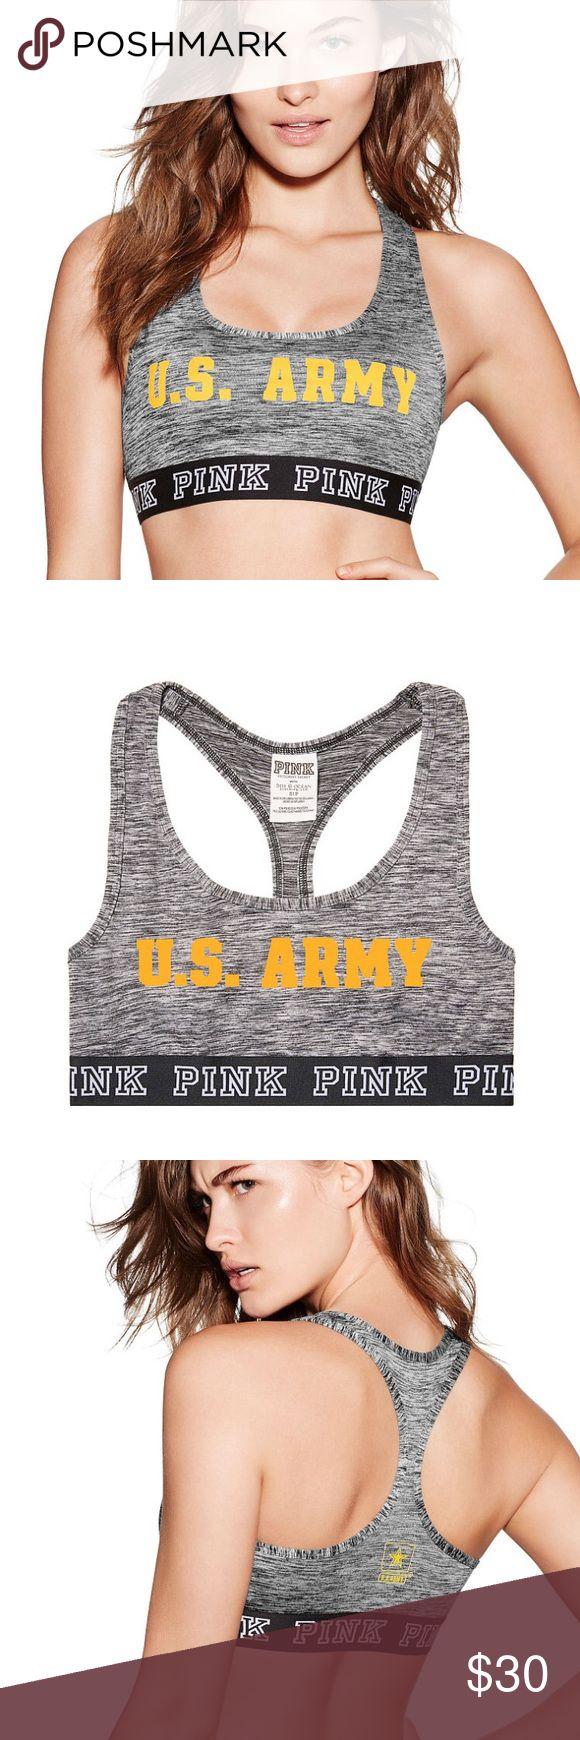 0d4d13a76dd51 NWT Victoria s Secret PINK ARMY Logo Crop Bra NWT